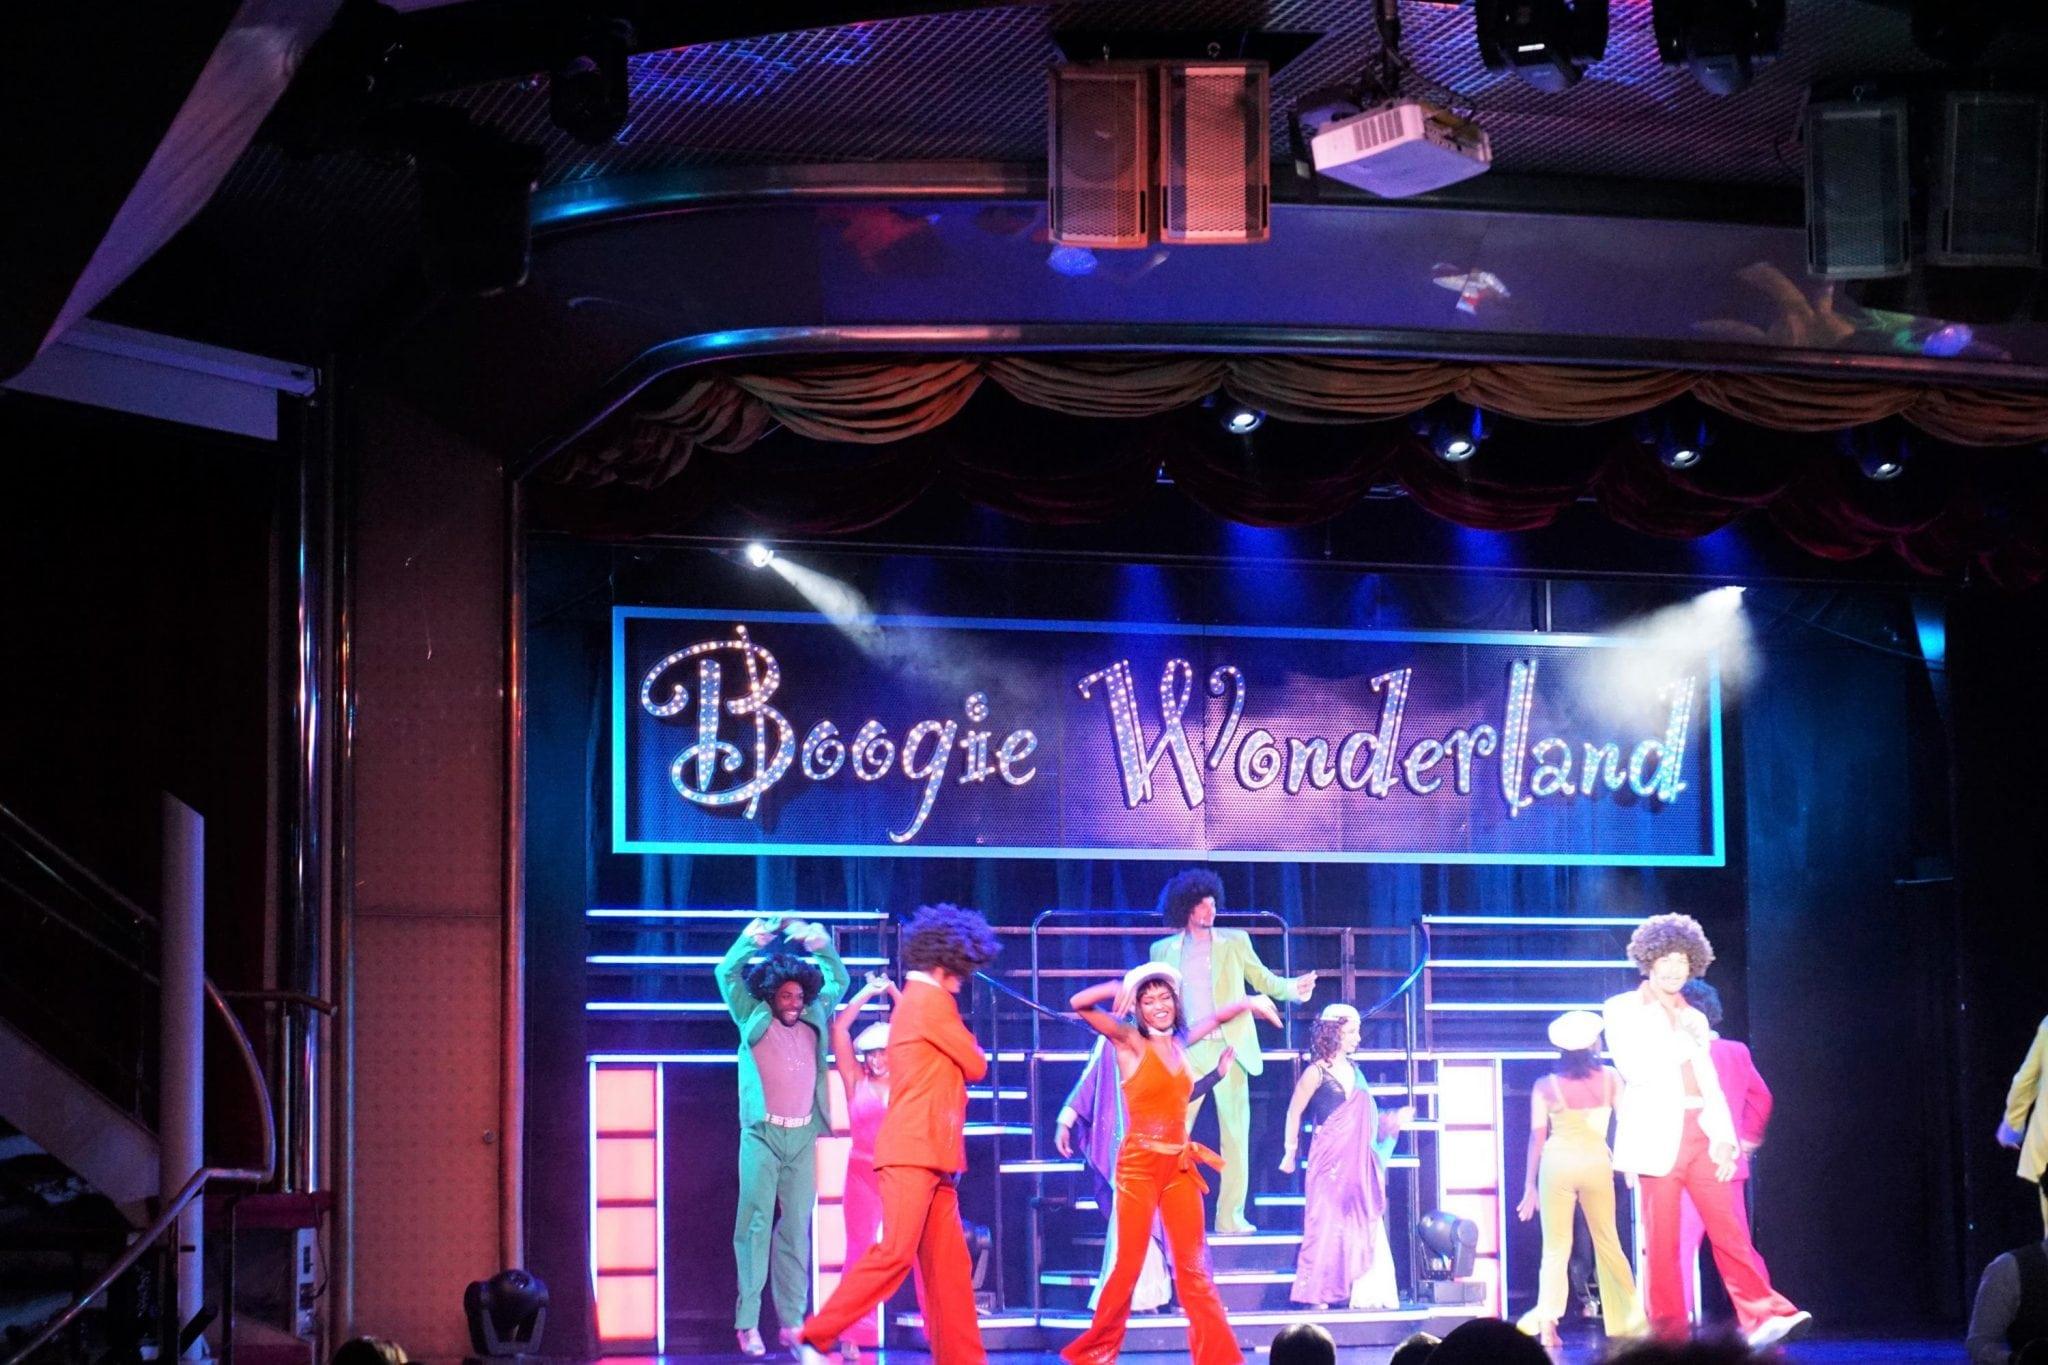 Main Theater Show on Mjesty of the Seas